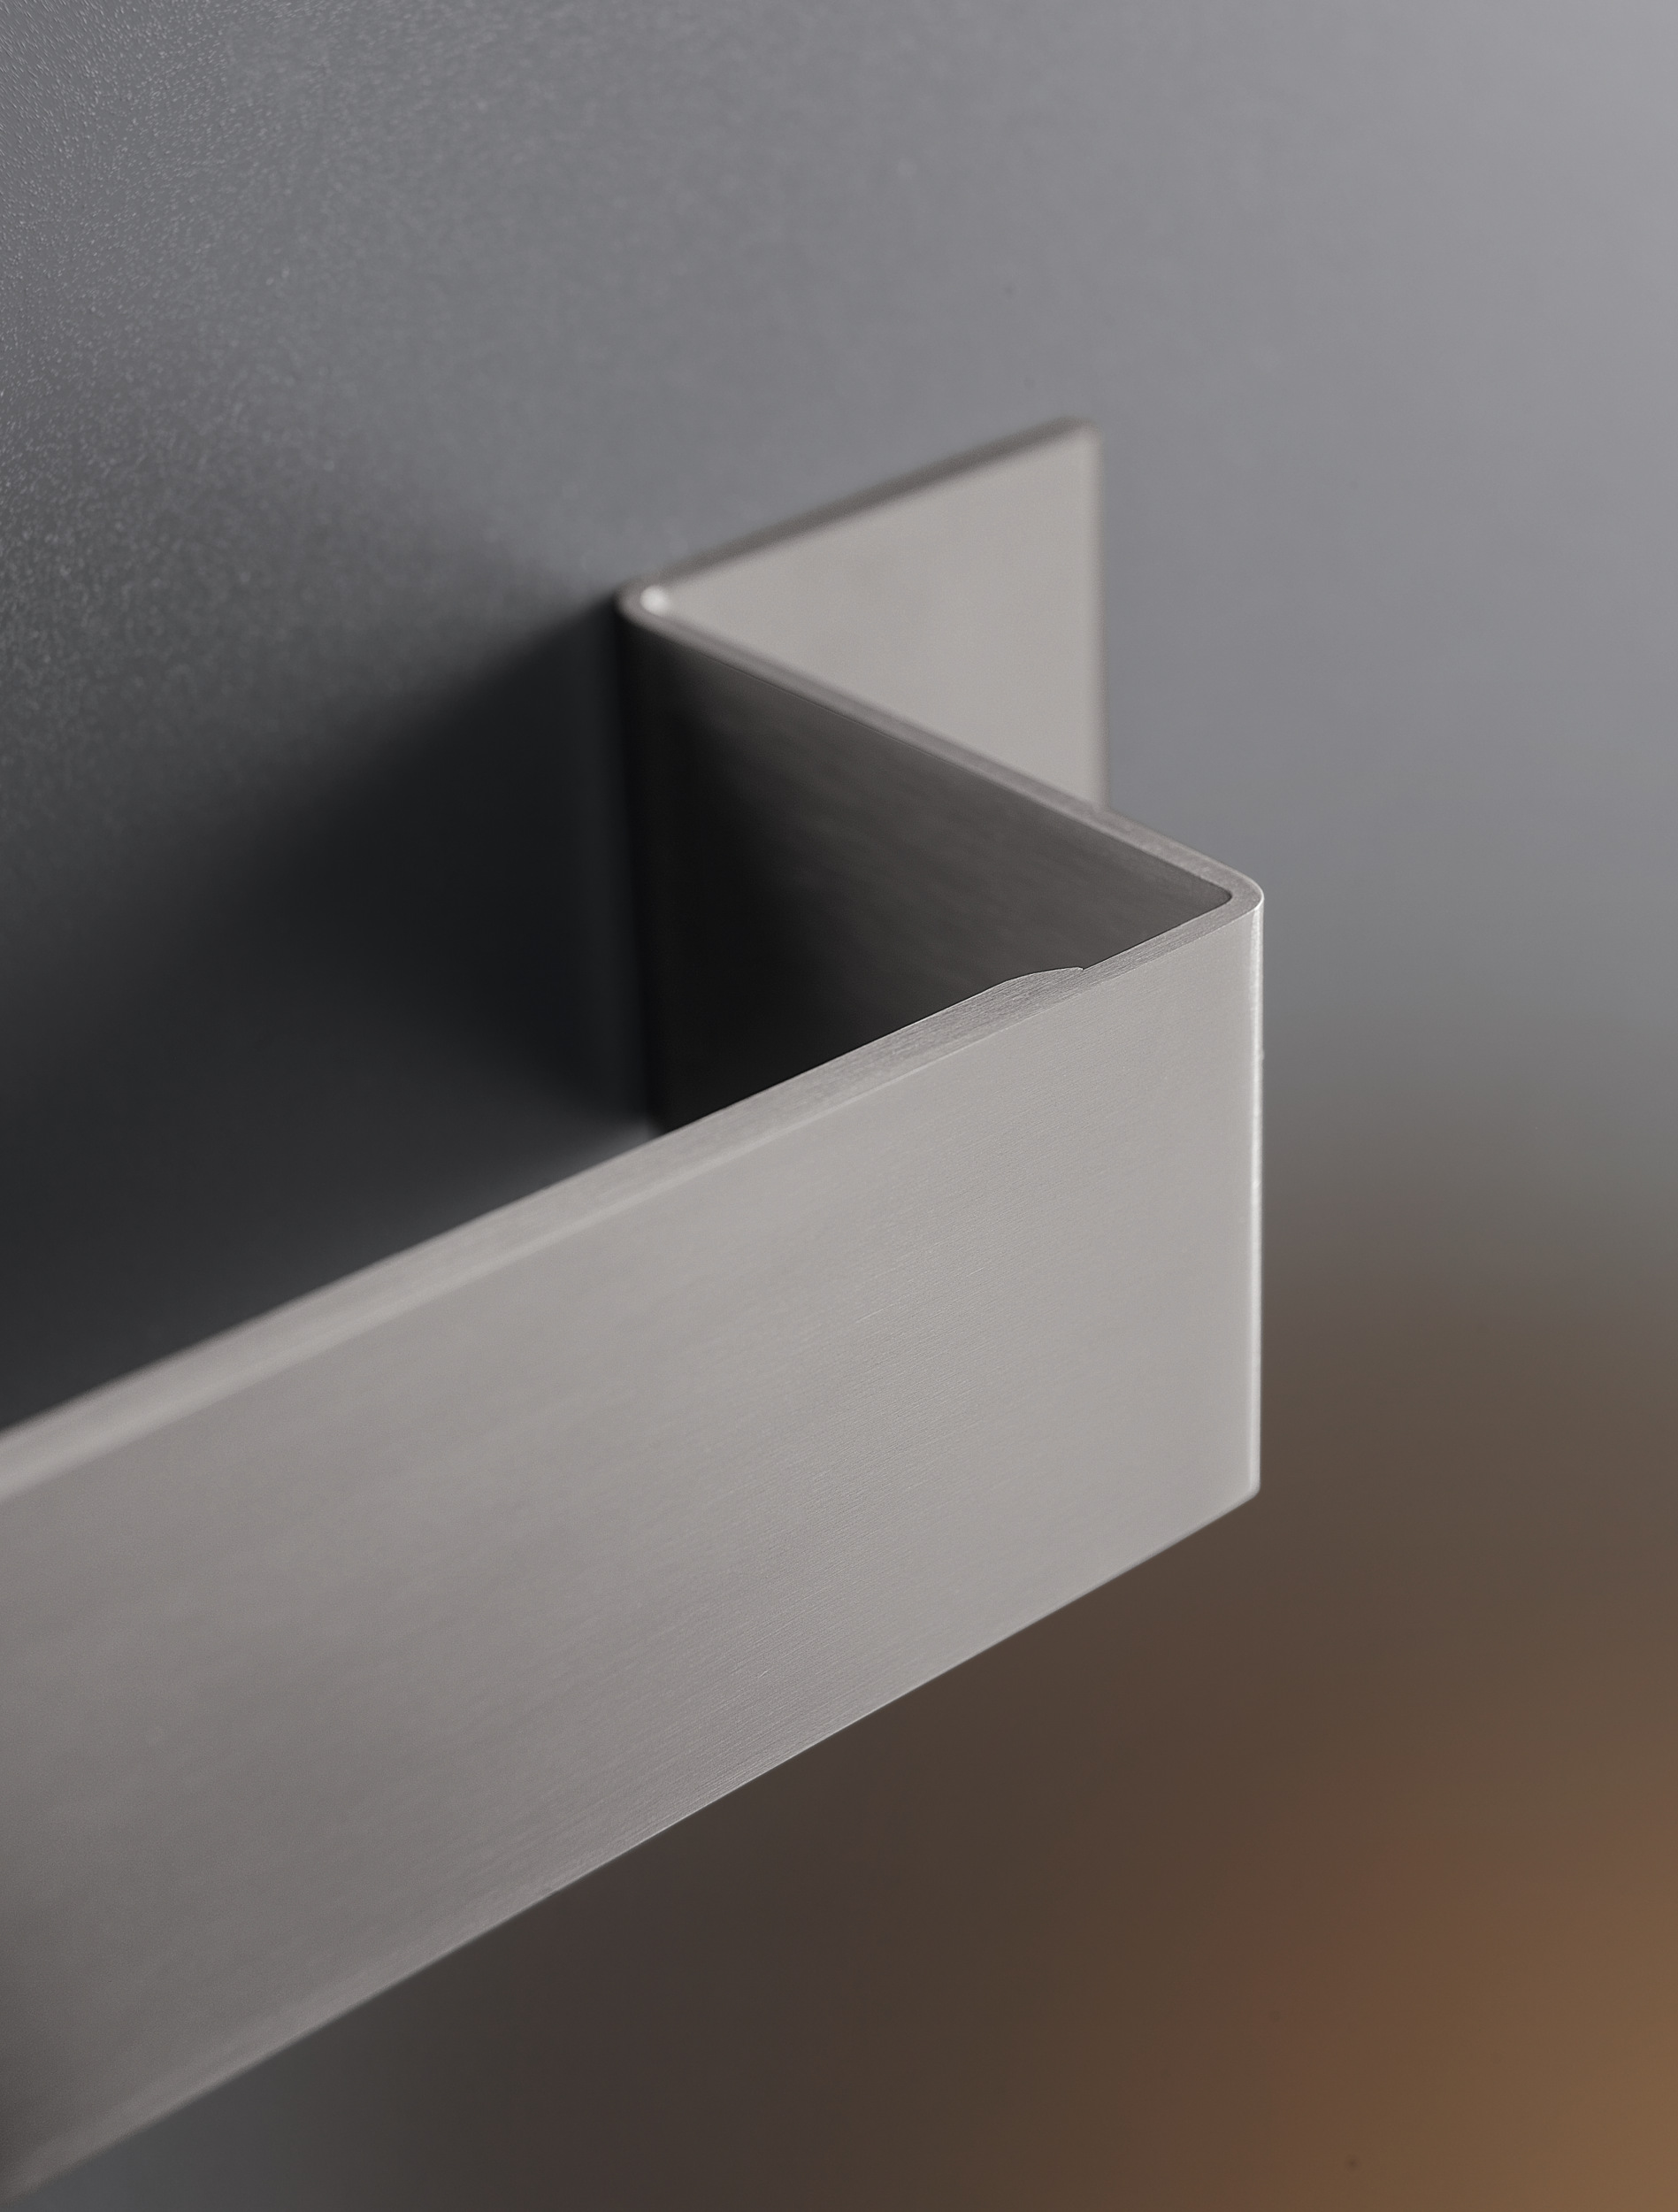 Portasalviette neu 08 by ceadesign s r l s u design - Portasalviette design ...